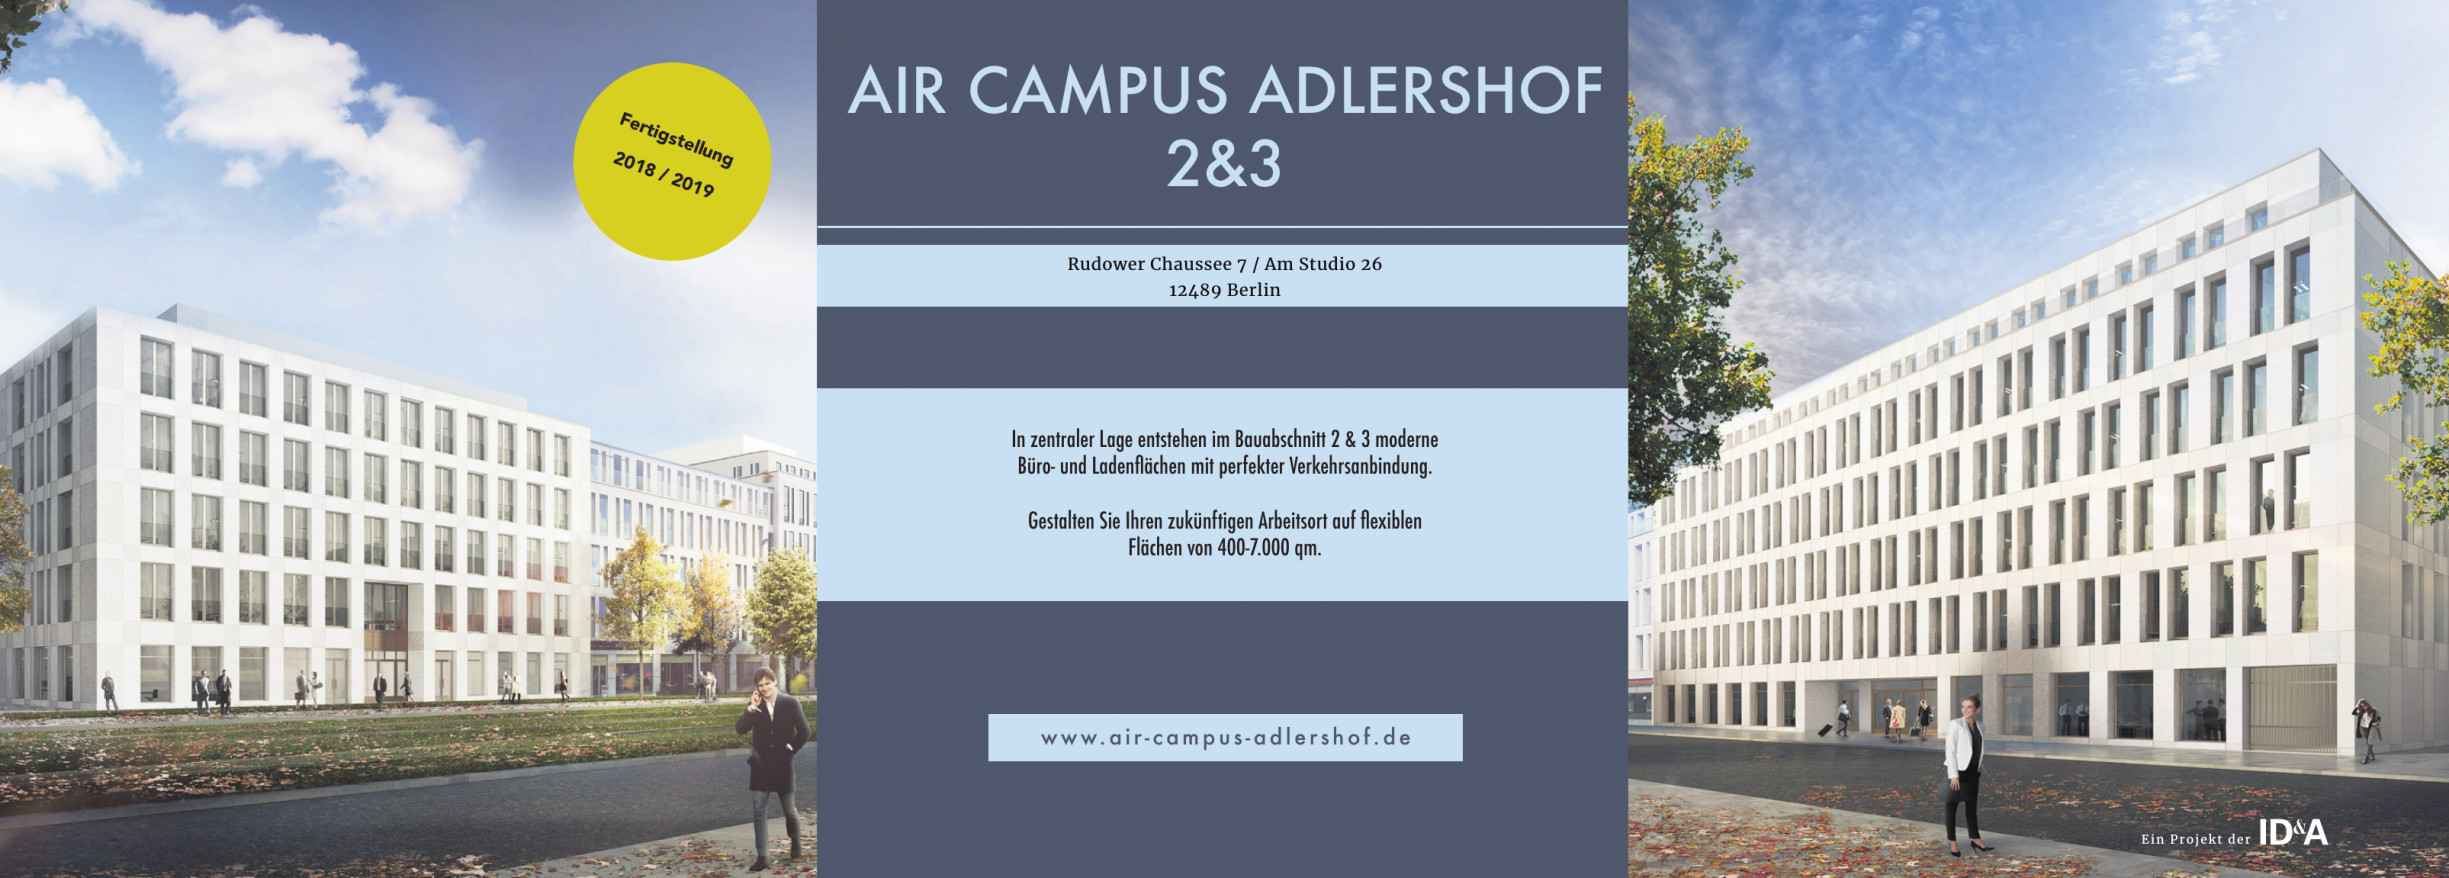 AIR CAMPUS ADLERSHOF 2&3